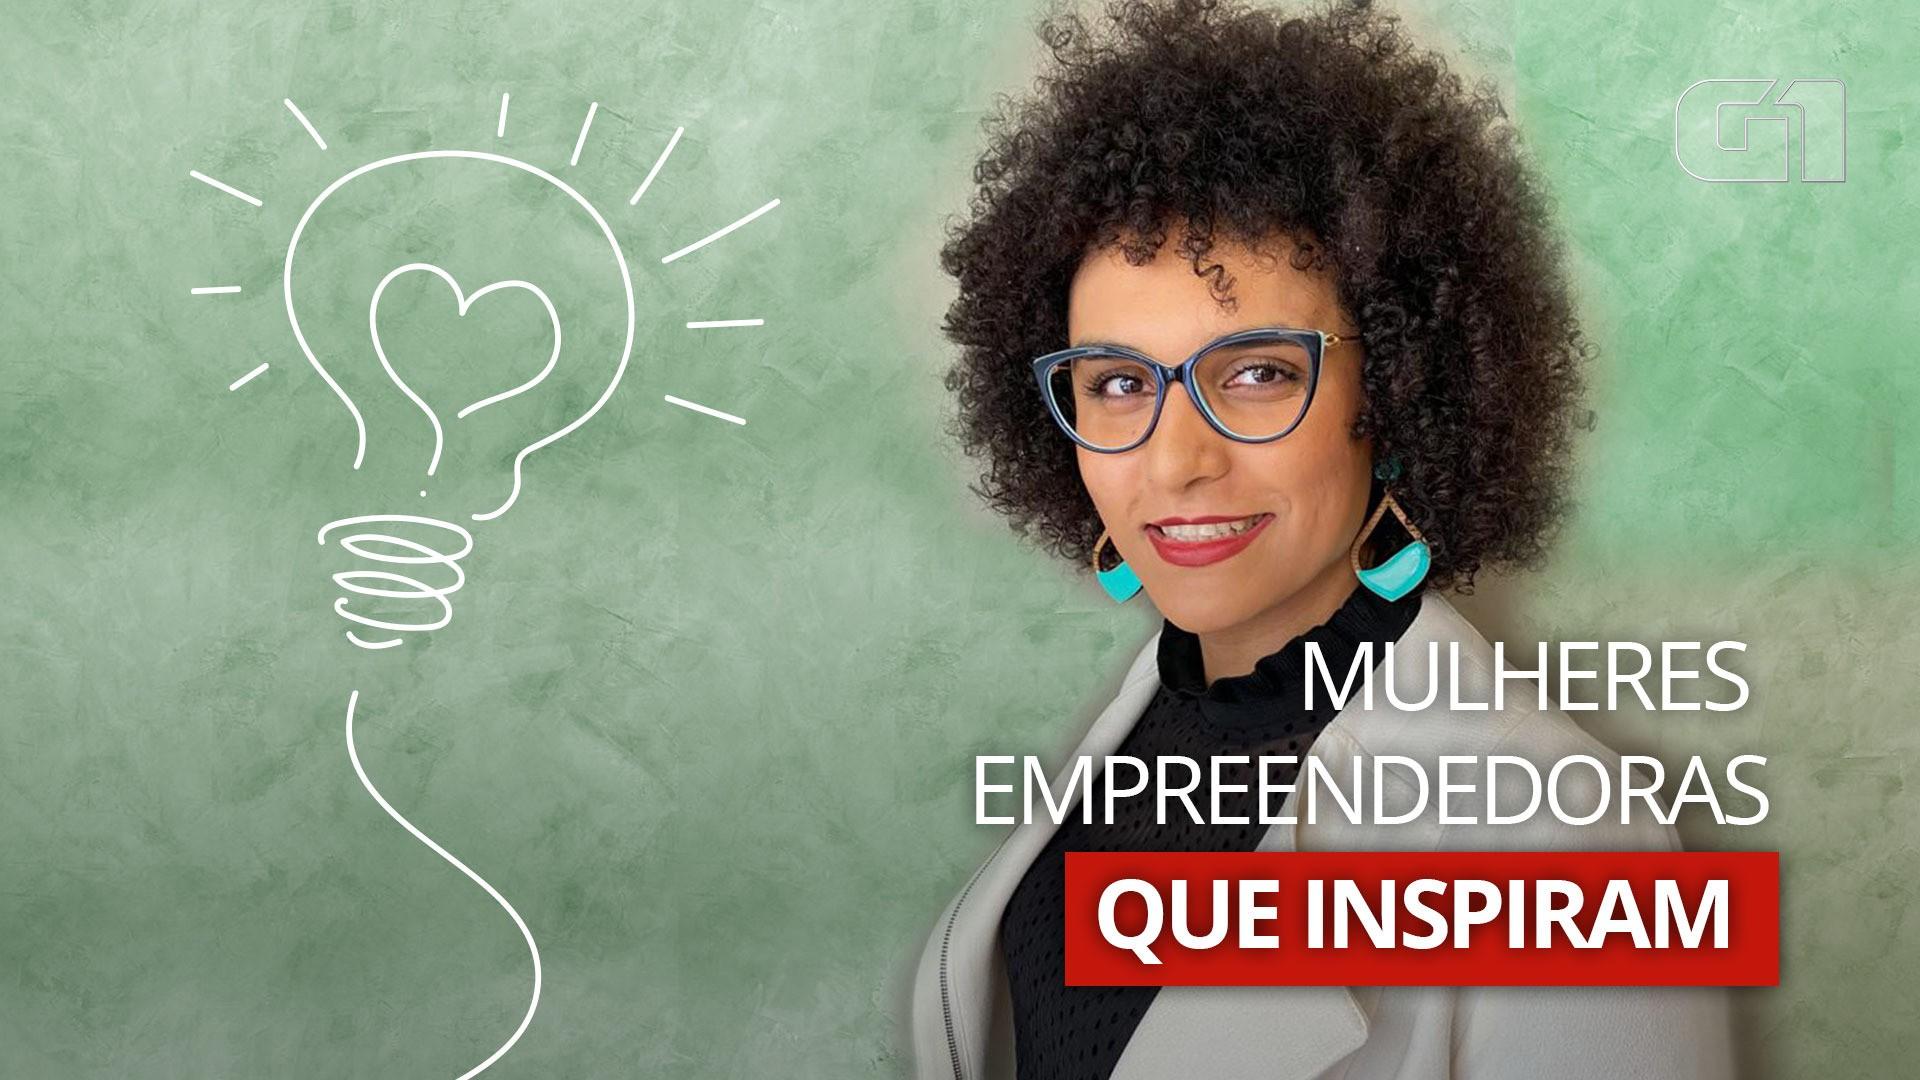 VÍDEOS: Mulheres empreendedoras que inspiram